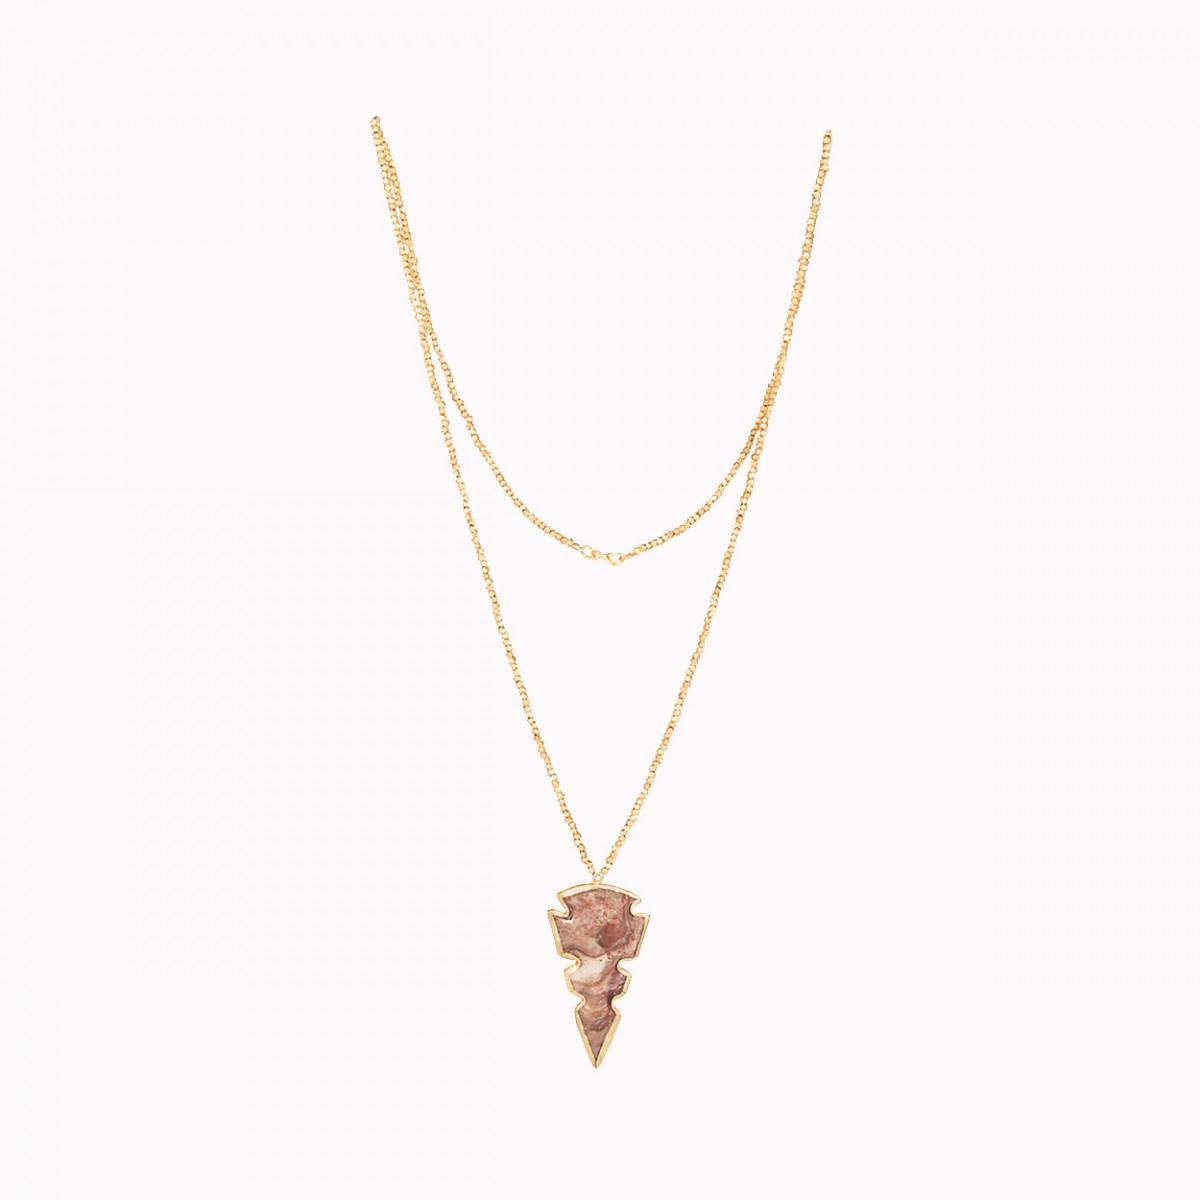 Mantra jasper pendant necklace